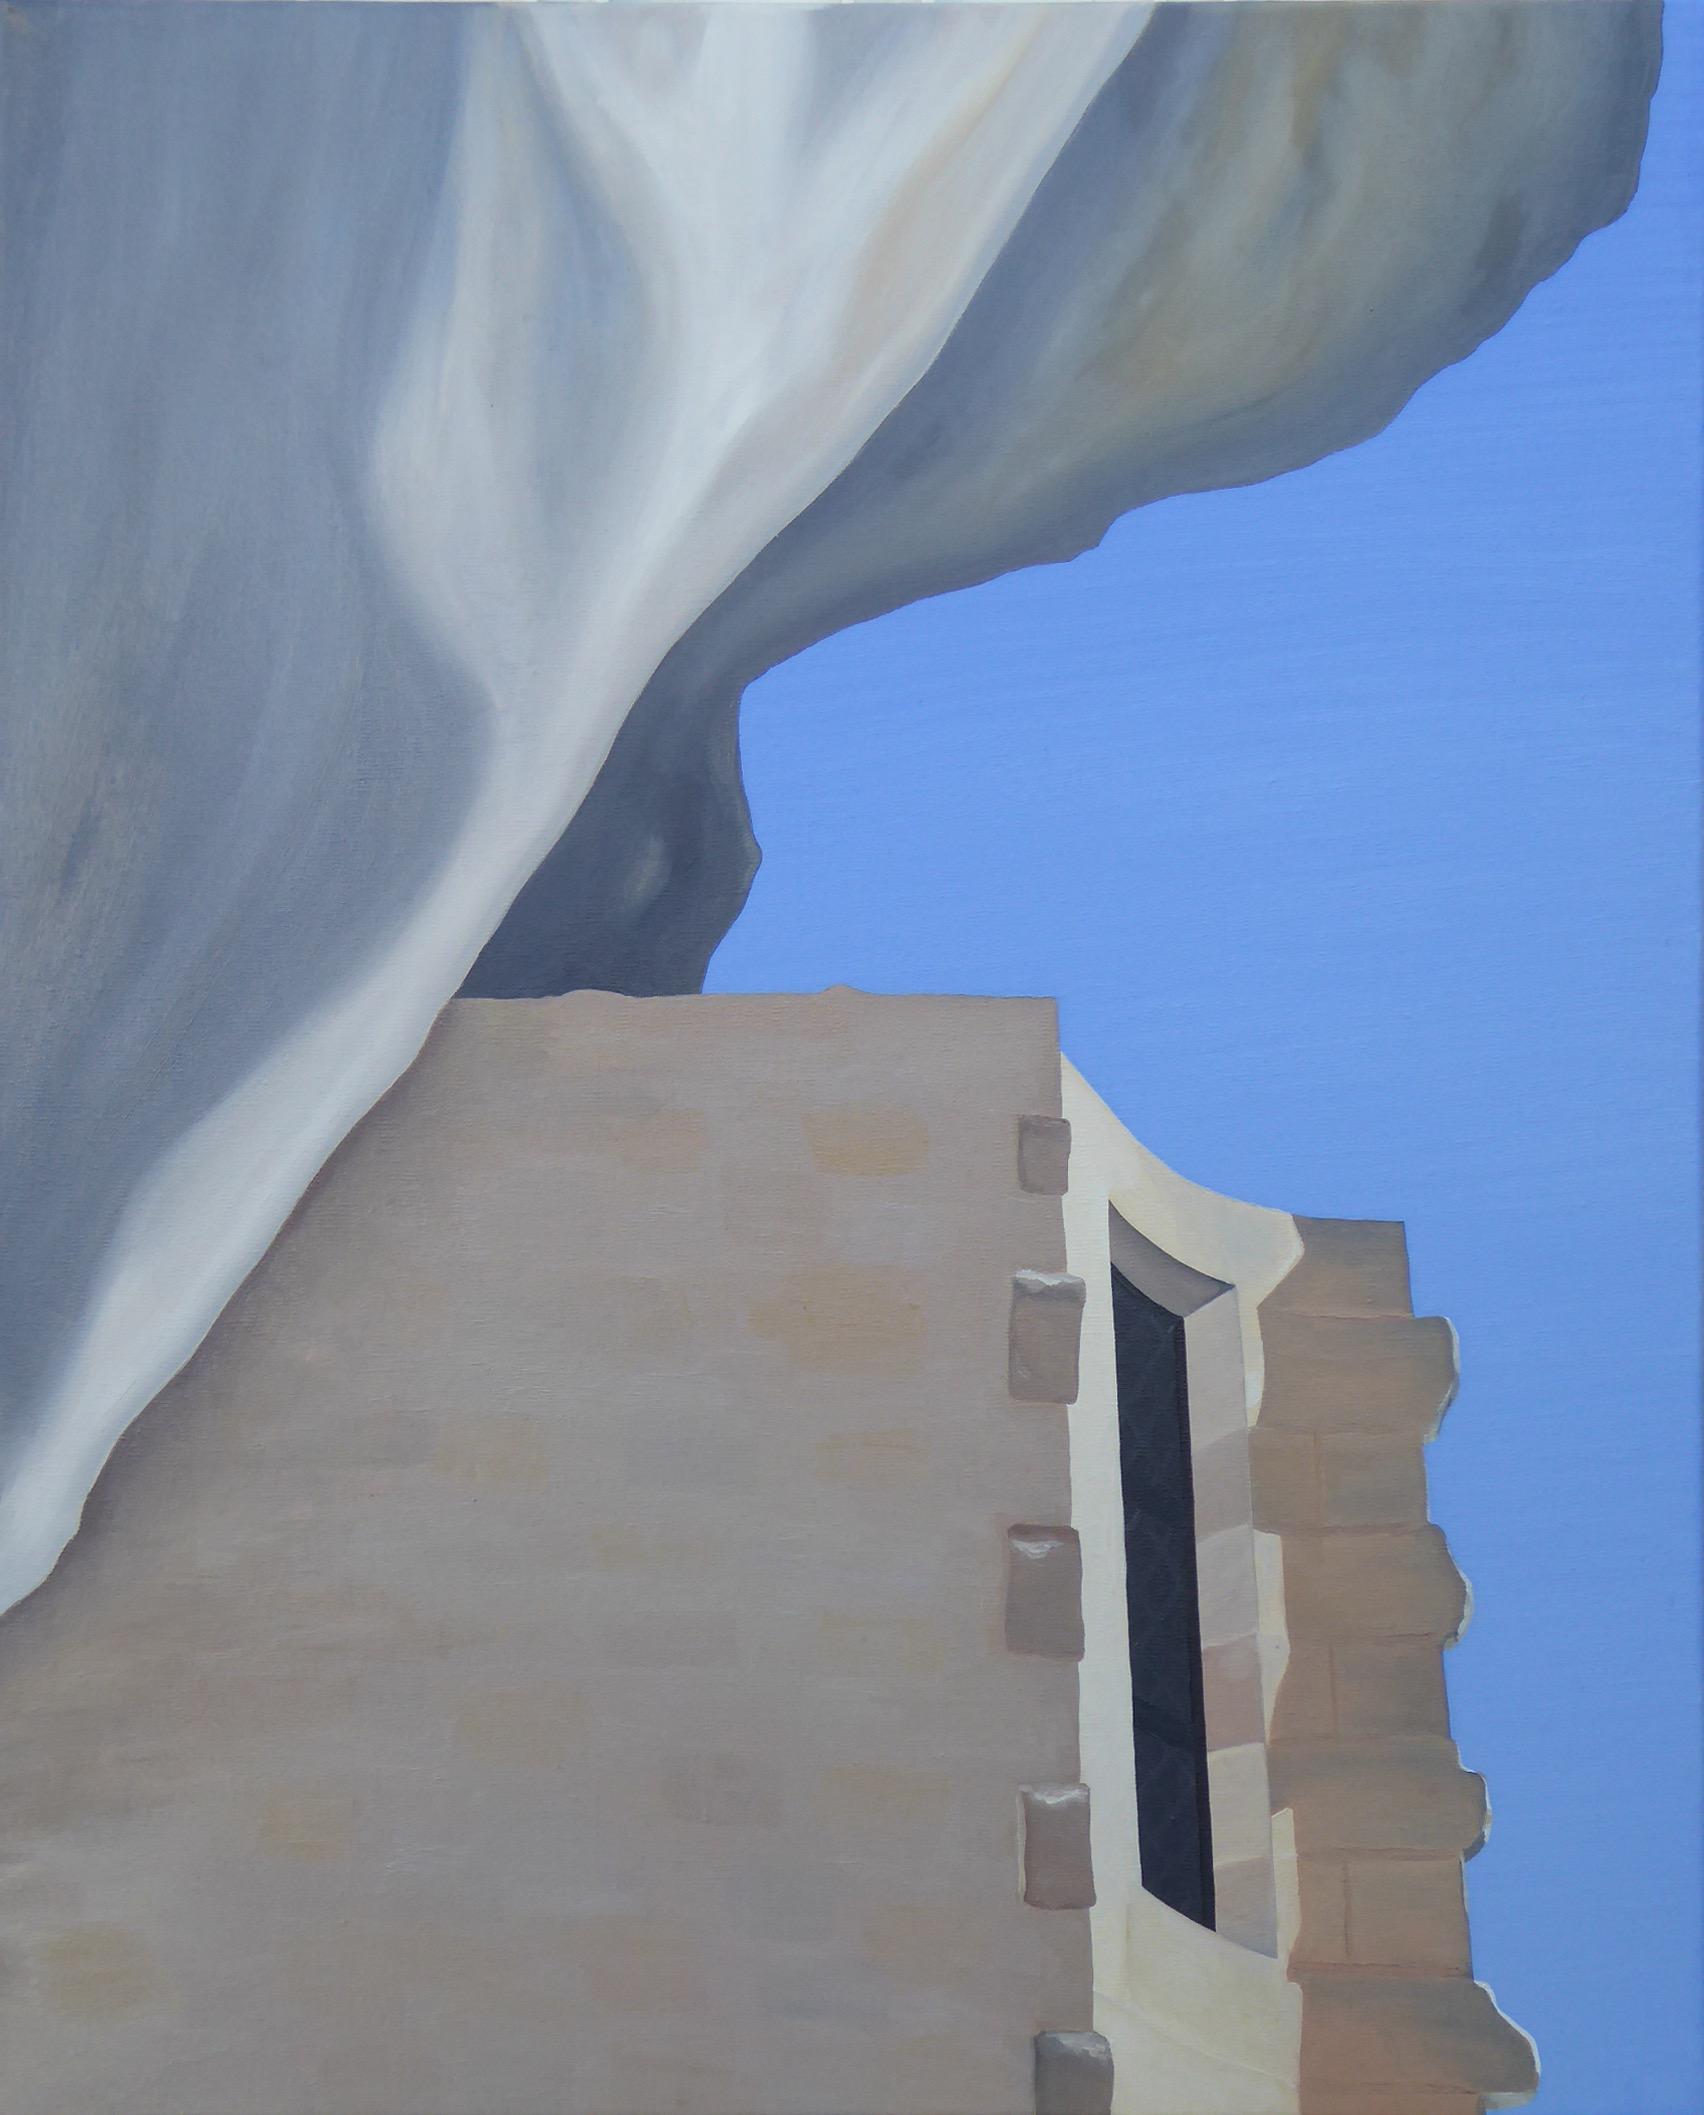 Les Eyzies X, olja/duk, 60x73 cm